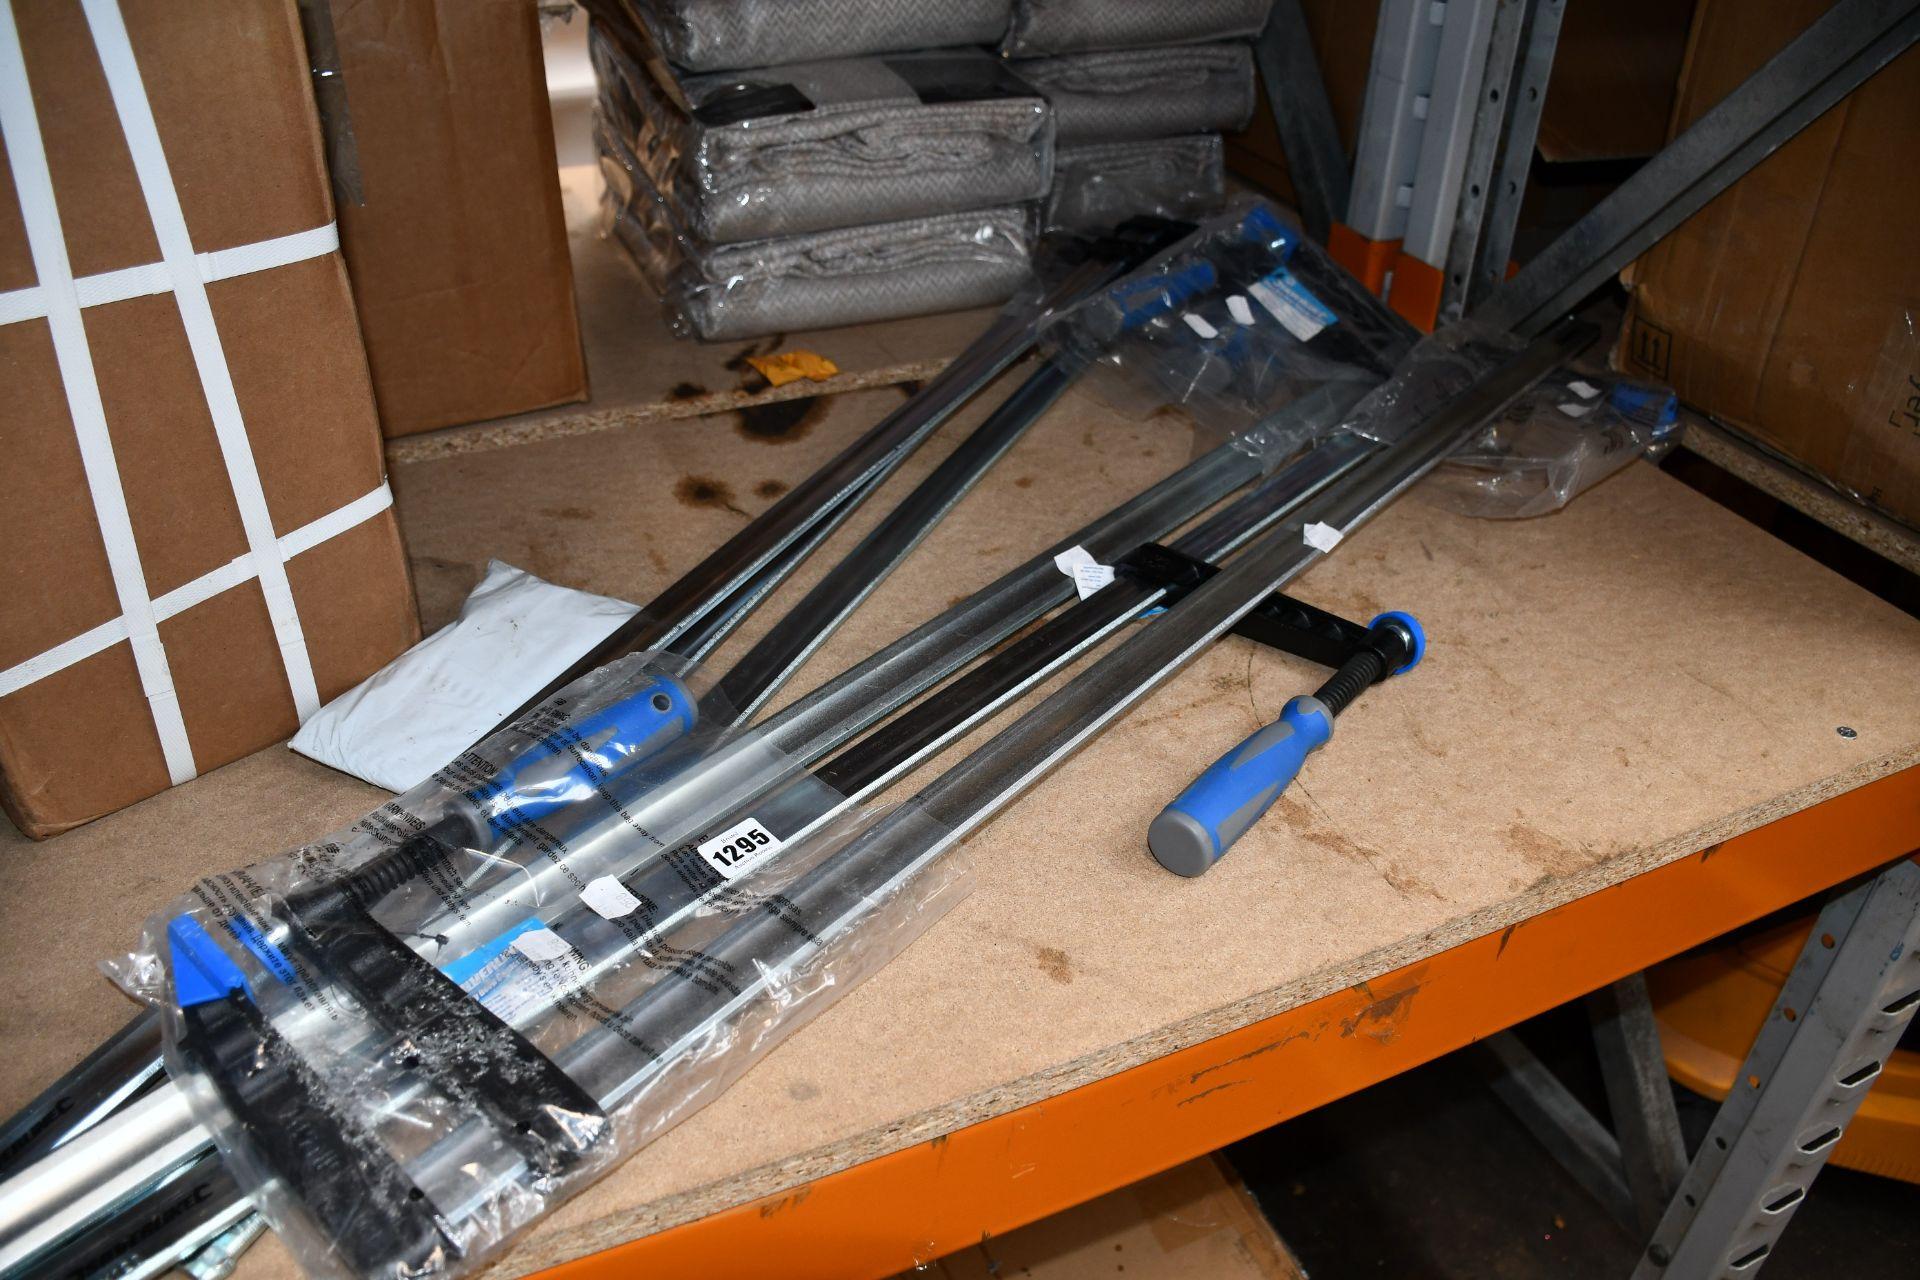 Lot 1295 - Six as new Silverline 598414 F-clamp (Heavy duty, deep capacity 1000 X 120mm).